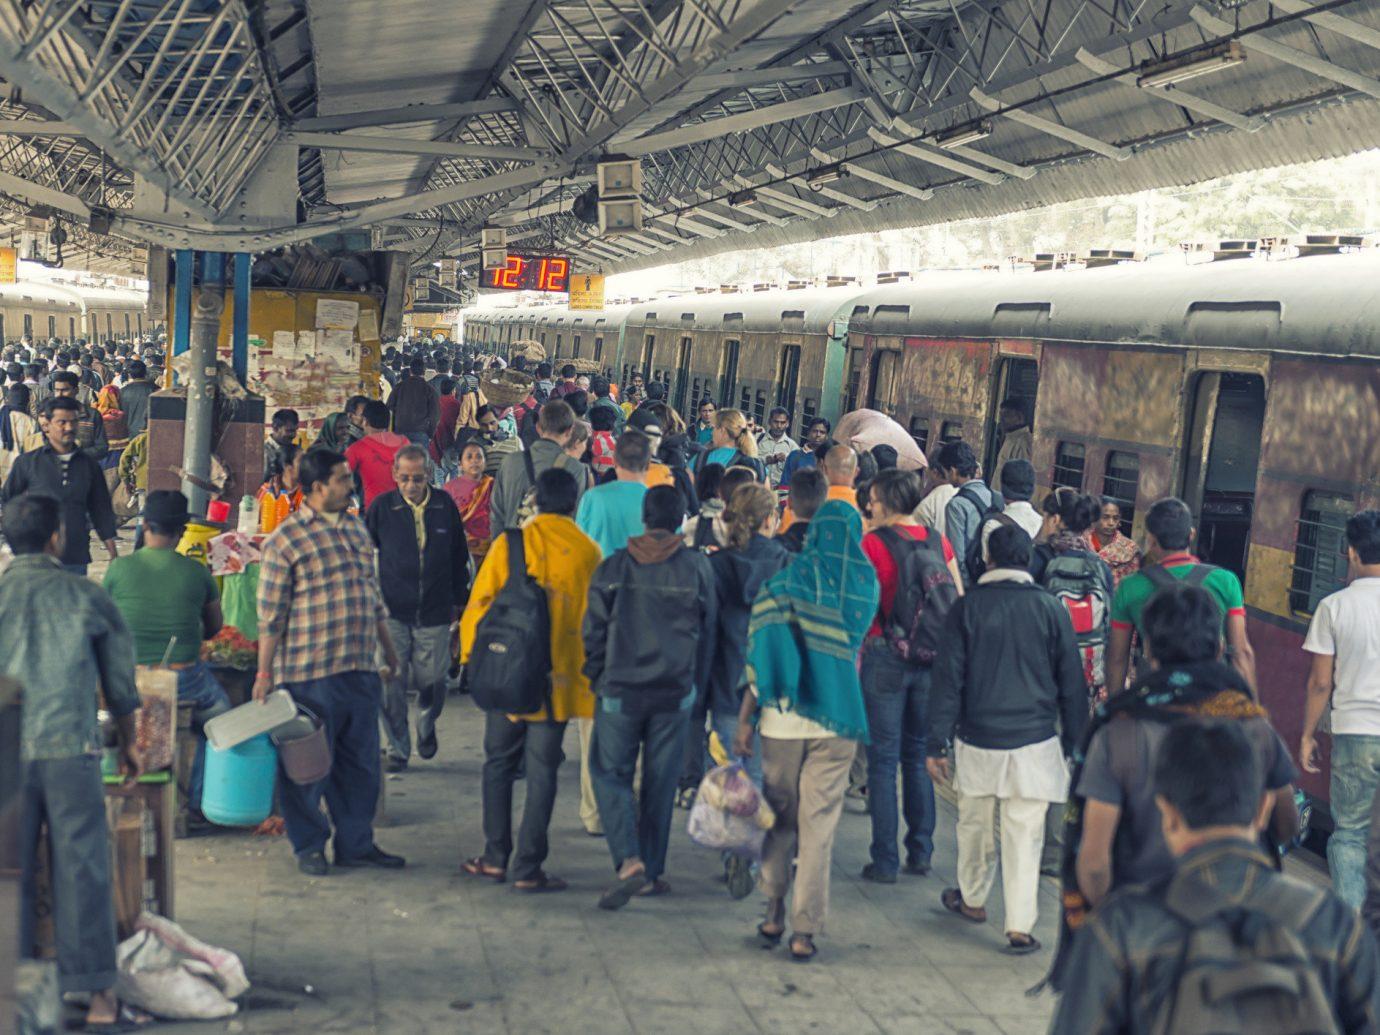 Travel Tips person people crowd group luggage transport indoor waiting station City train market platform public transport passenger marketplace subway several